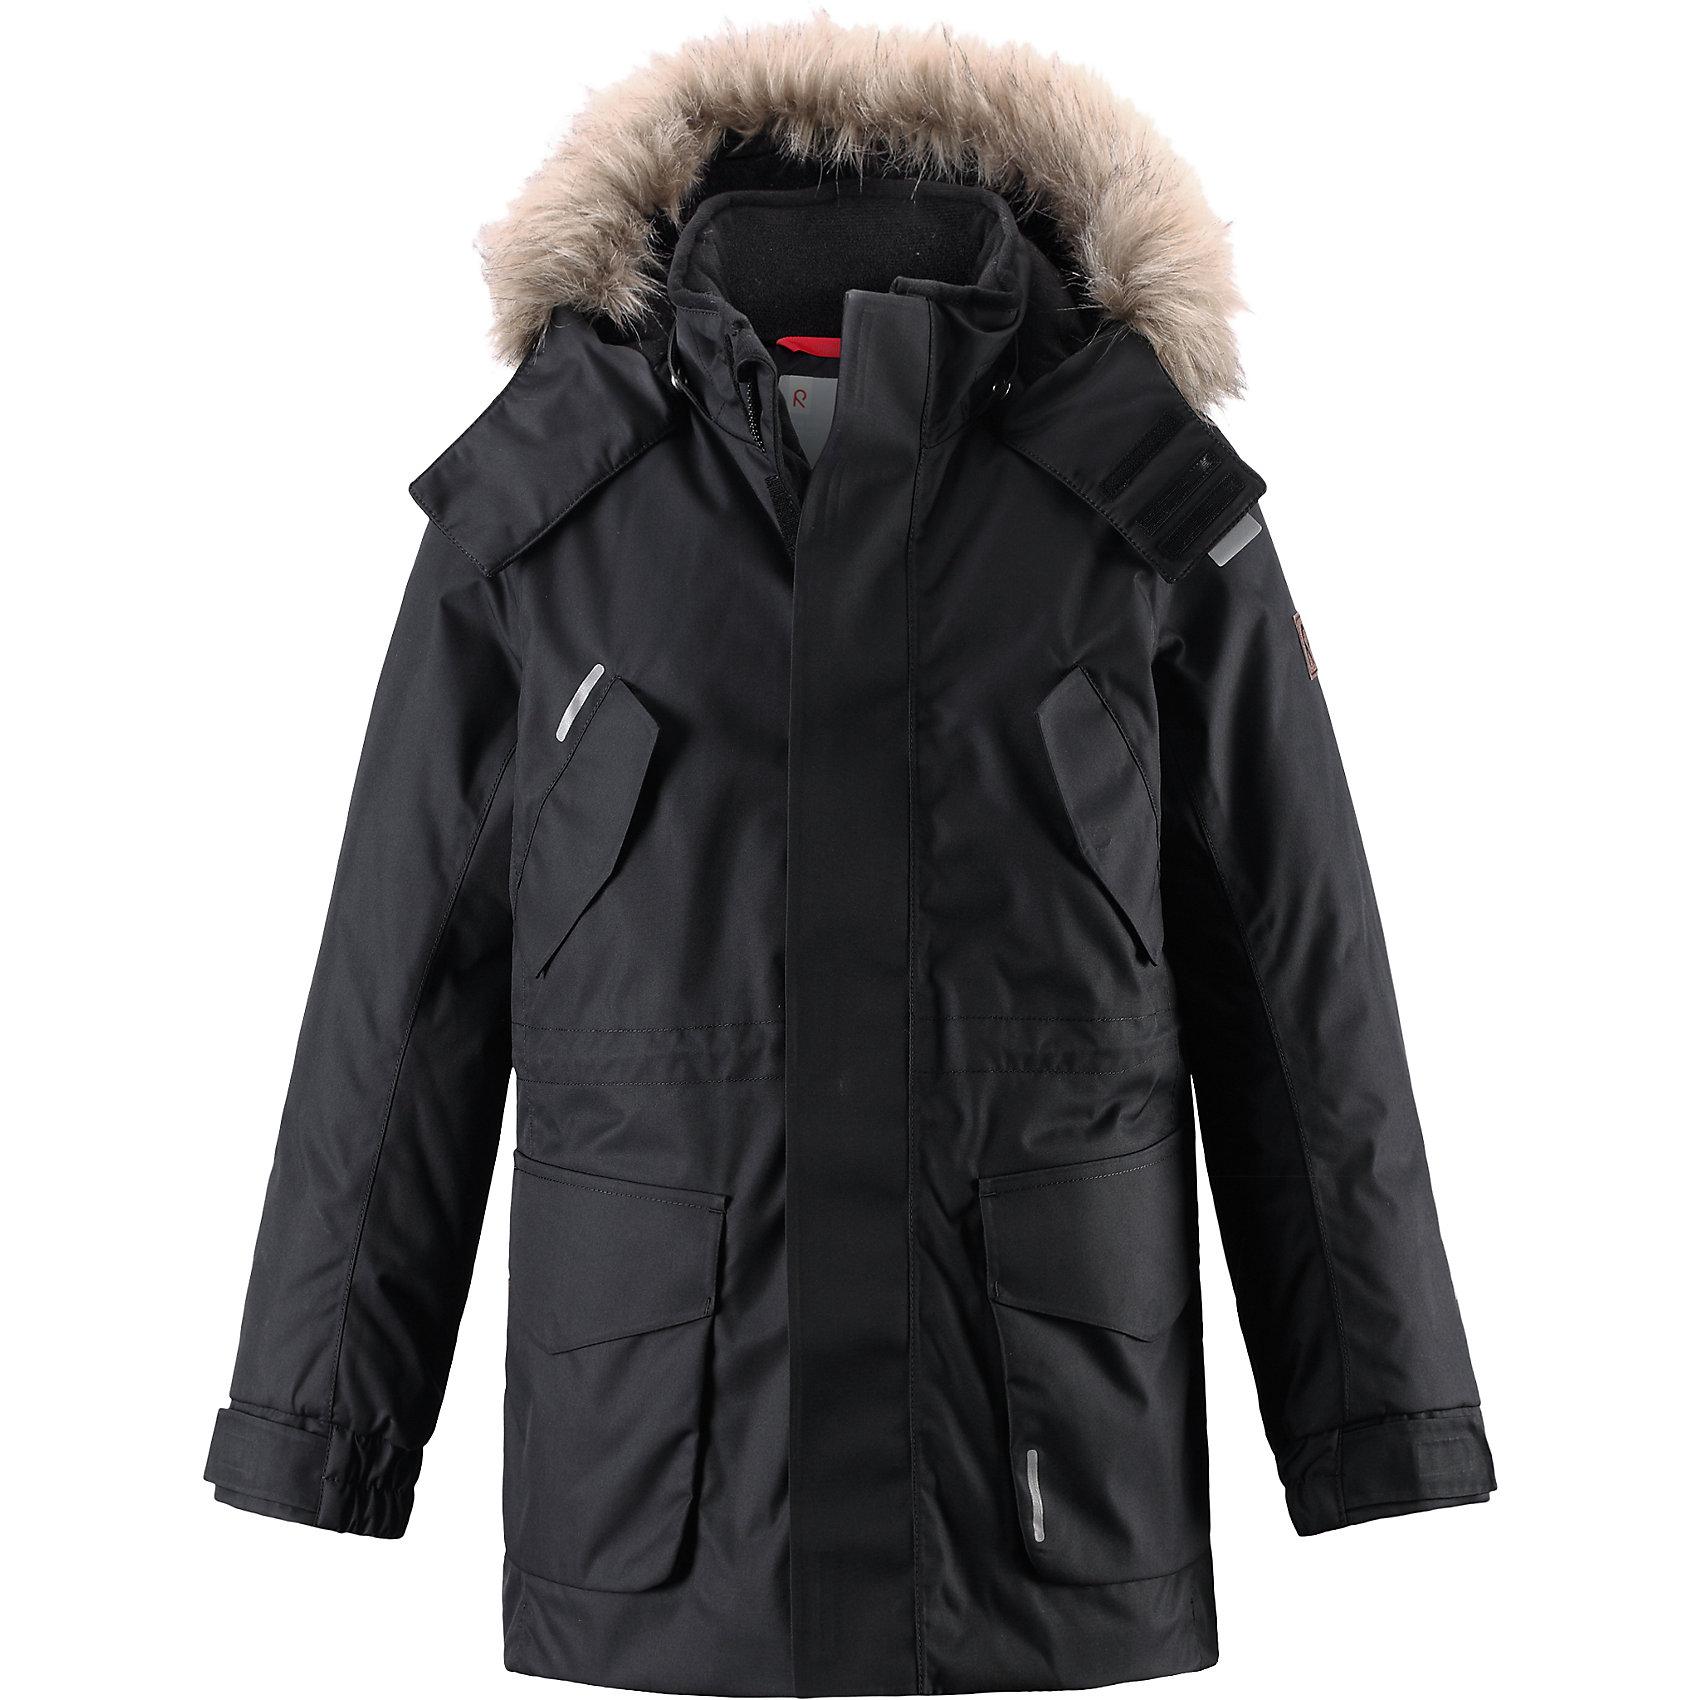 Reima Куртка Naapuri для мальчика Reimatec® Reima куртка детская reima reimatec naapuri цвет черный 5312999990 размер 116